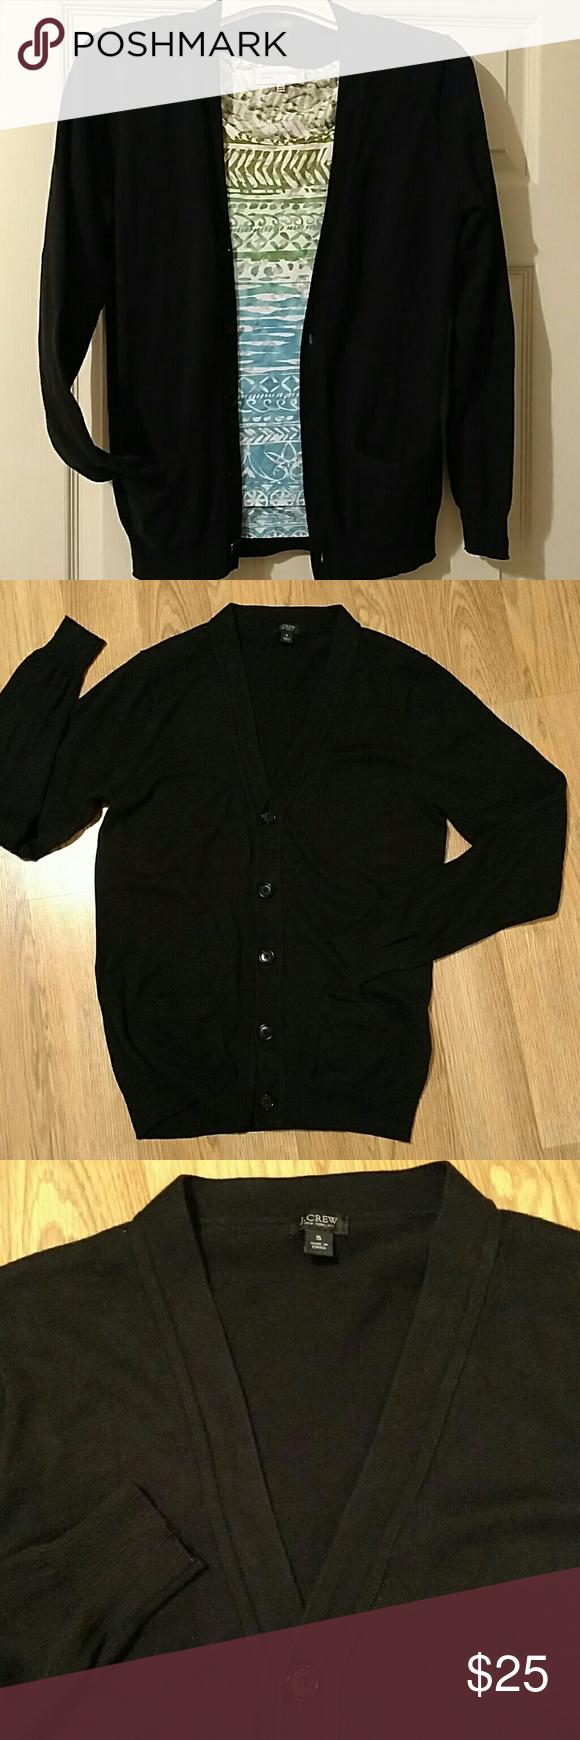 J Crew button up black cardigan J Crew Cotton/cashmere boyfriend ...